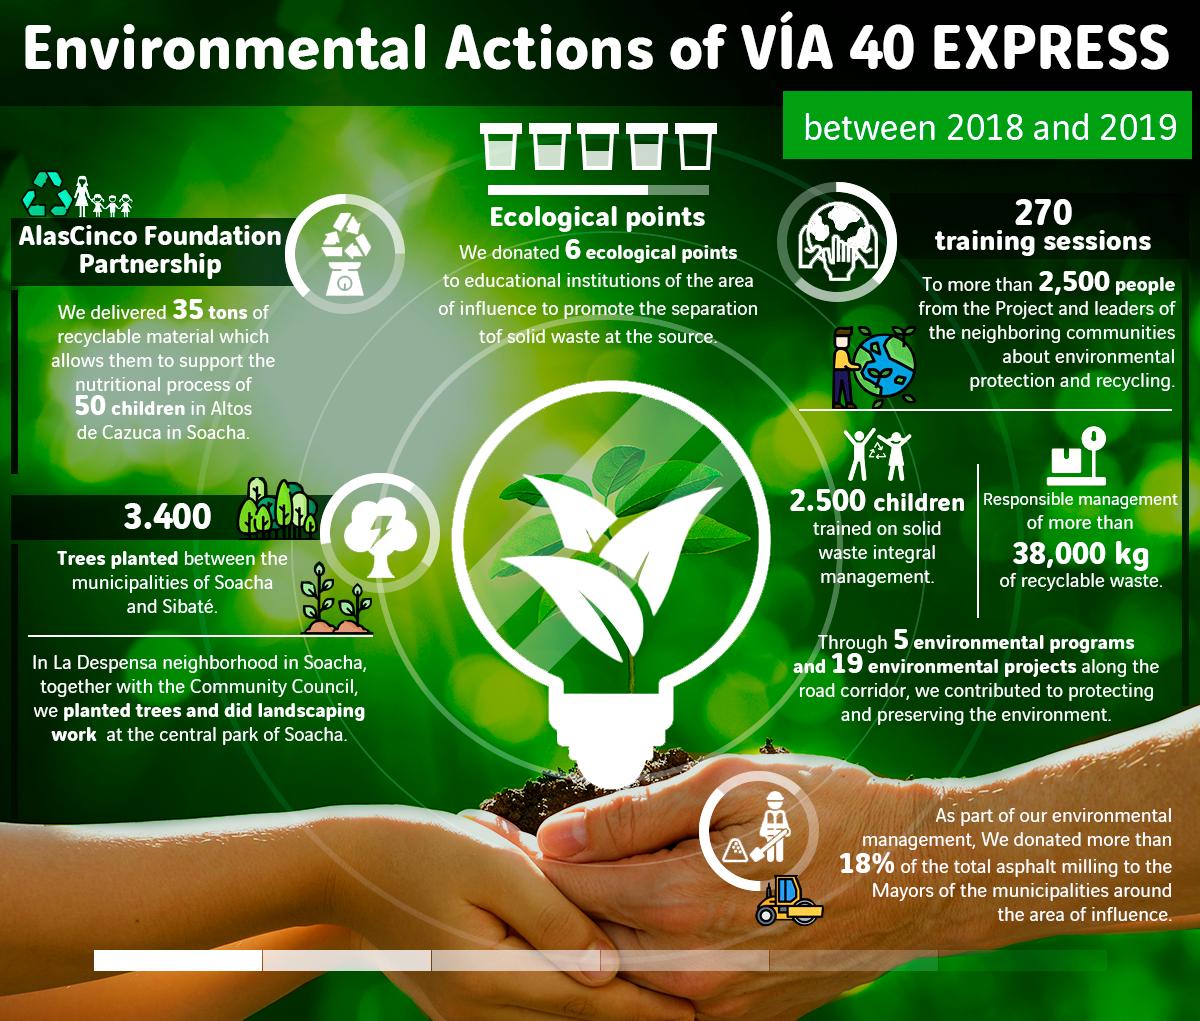 Huella ambiental via 40 express